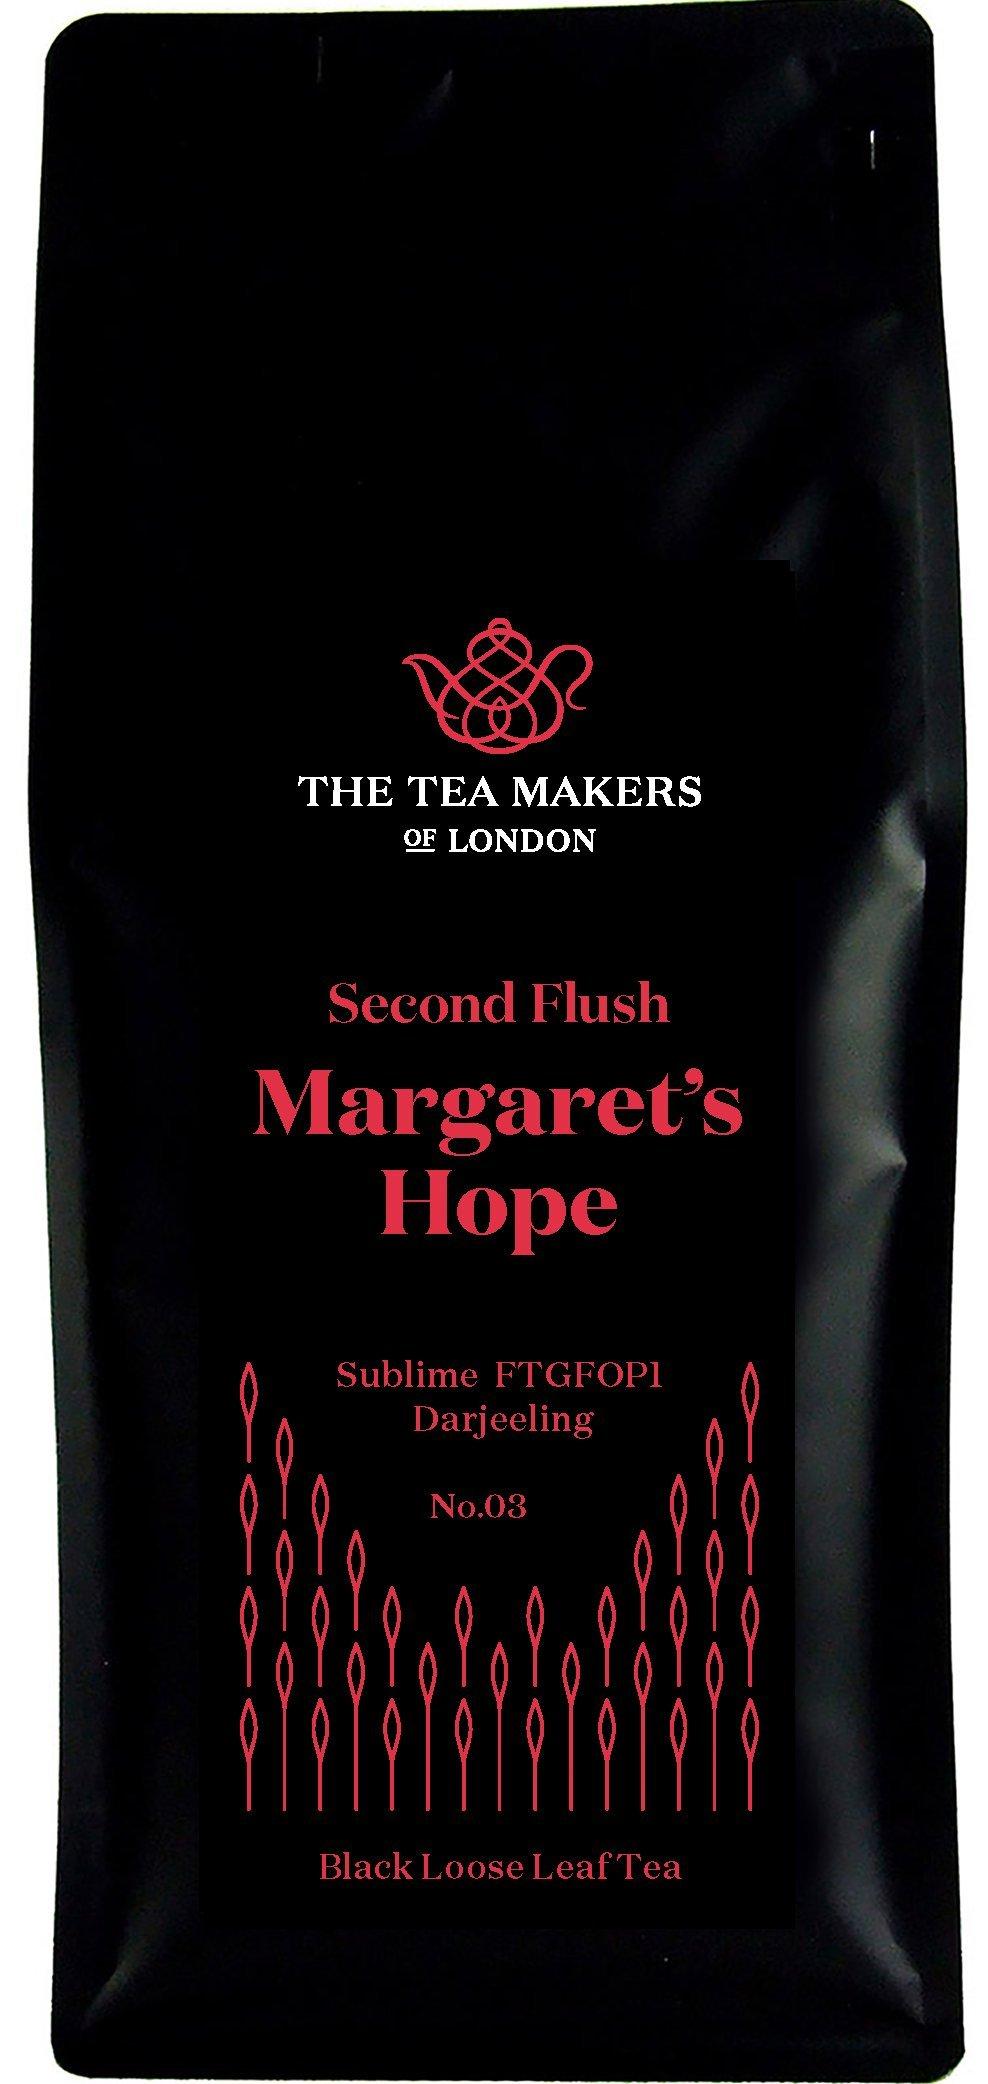 Margarets-Hope-Second-Flush-FTGFOP1-Darjeeling-Schwarztee